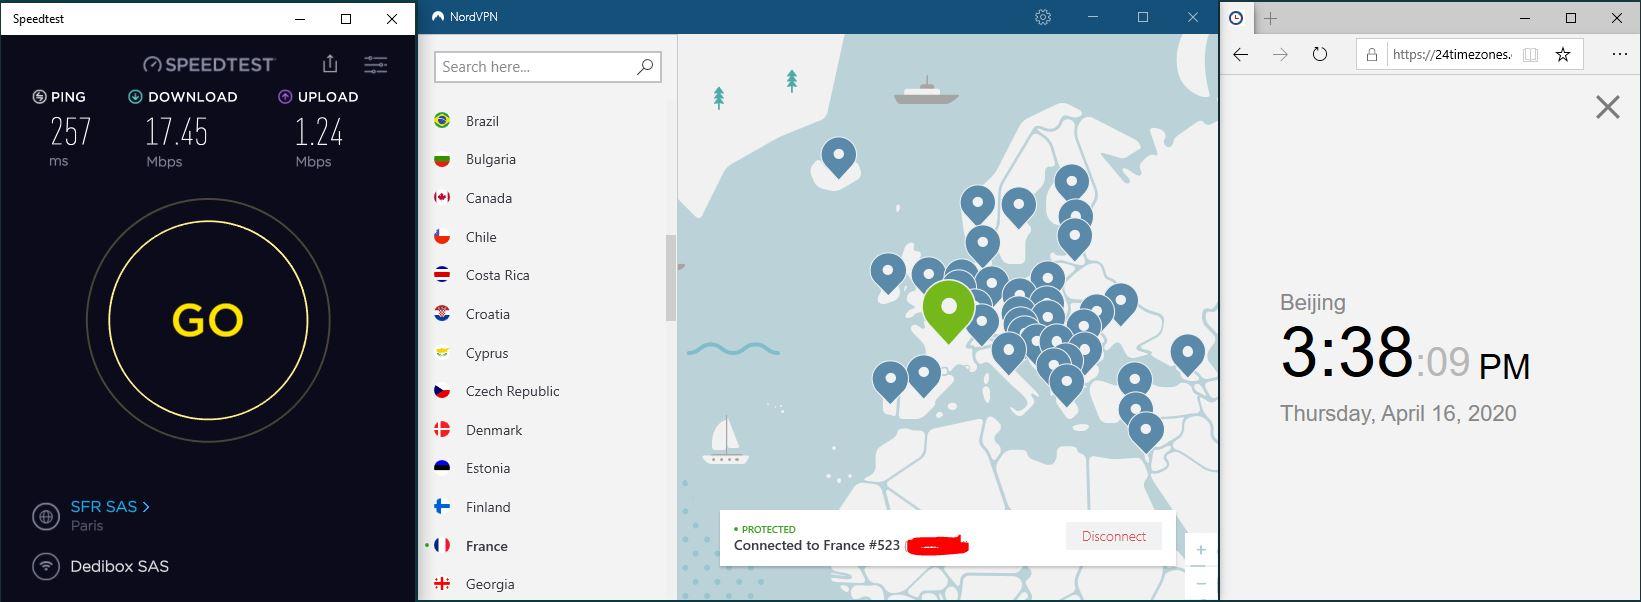 Windows10 NordVPN France #523 中国VPN 翻墙 科学上网 SpeedTest测速-20200416